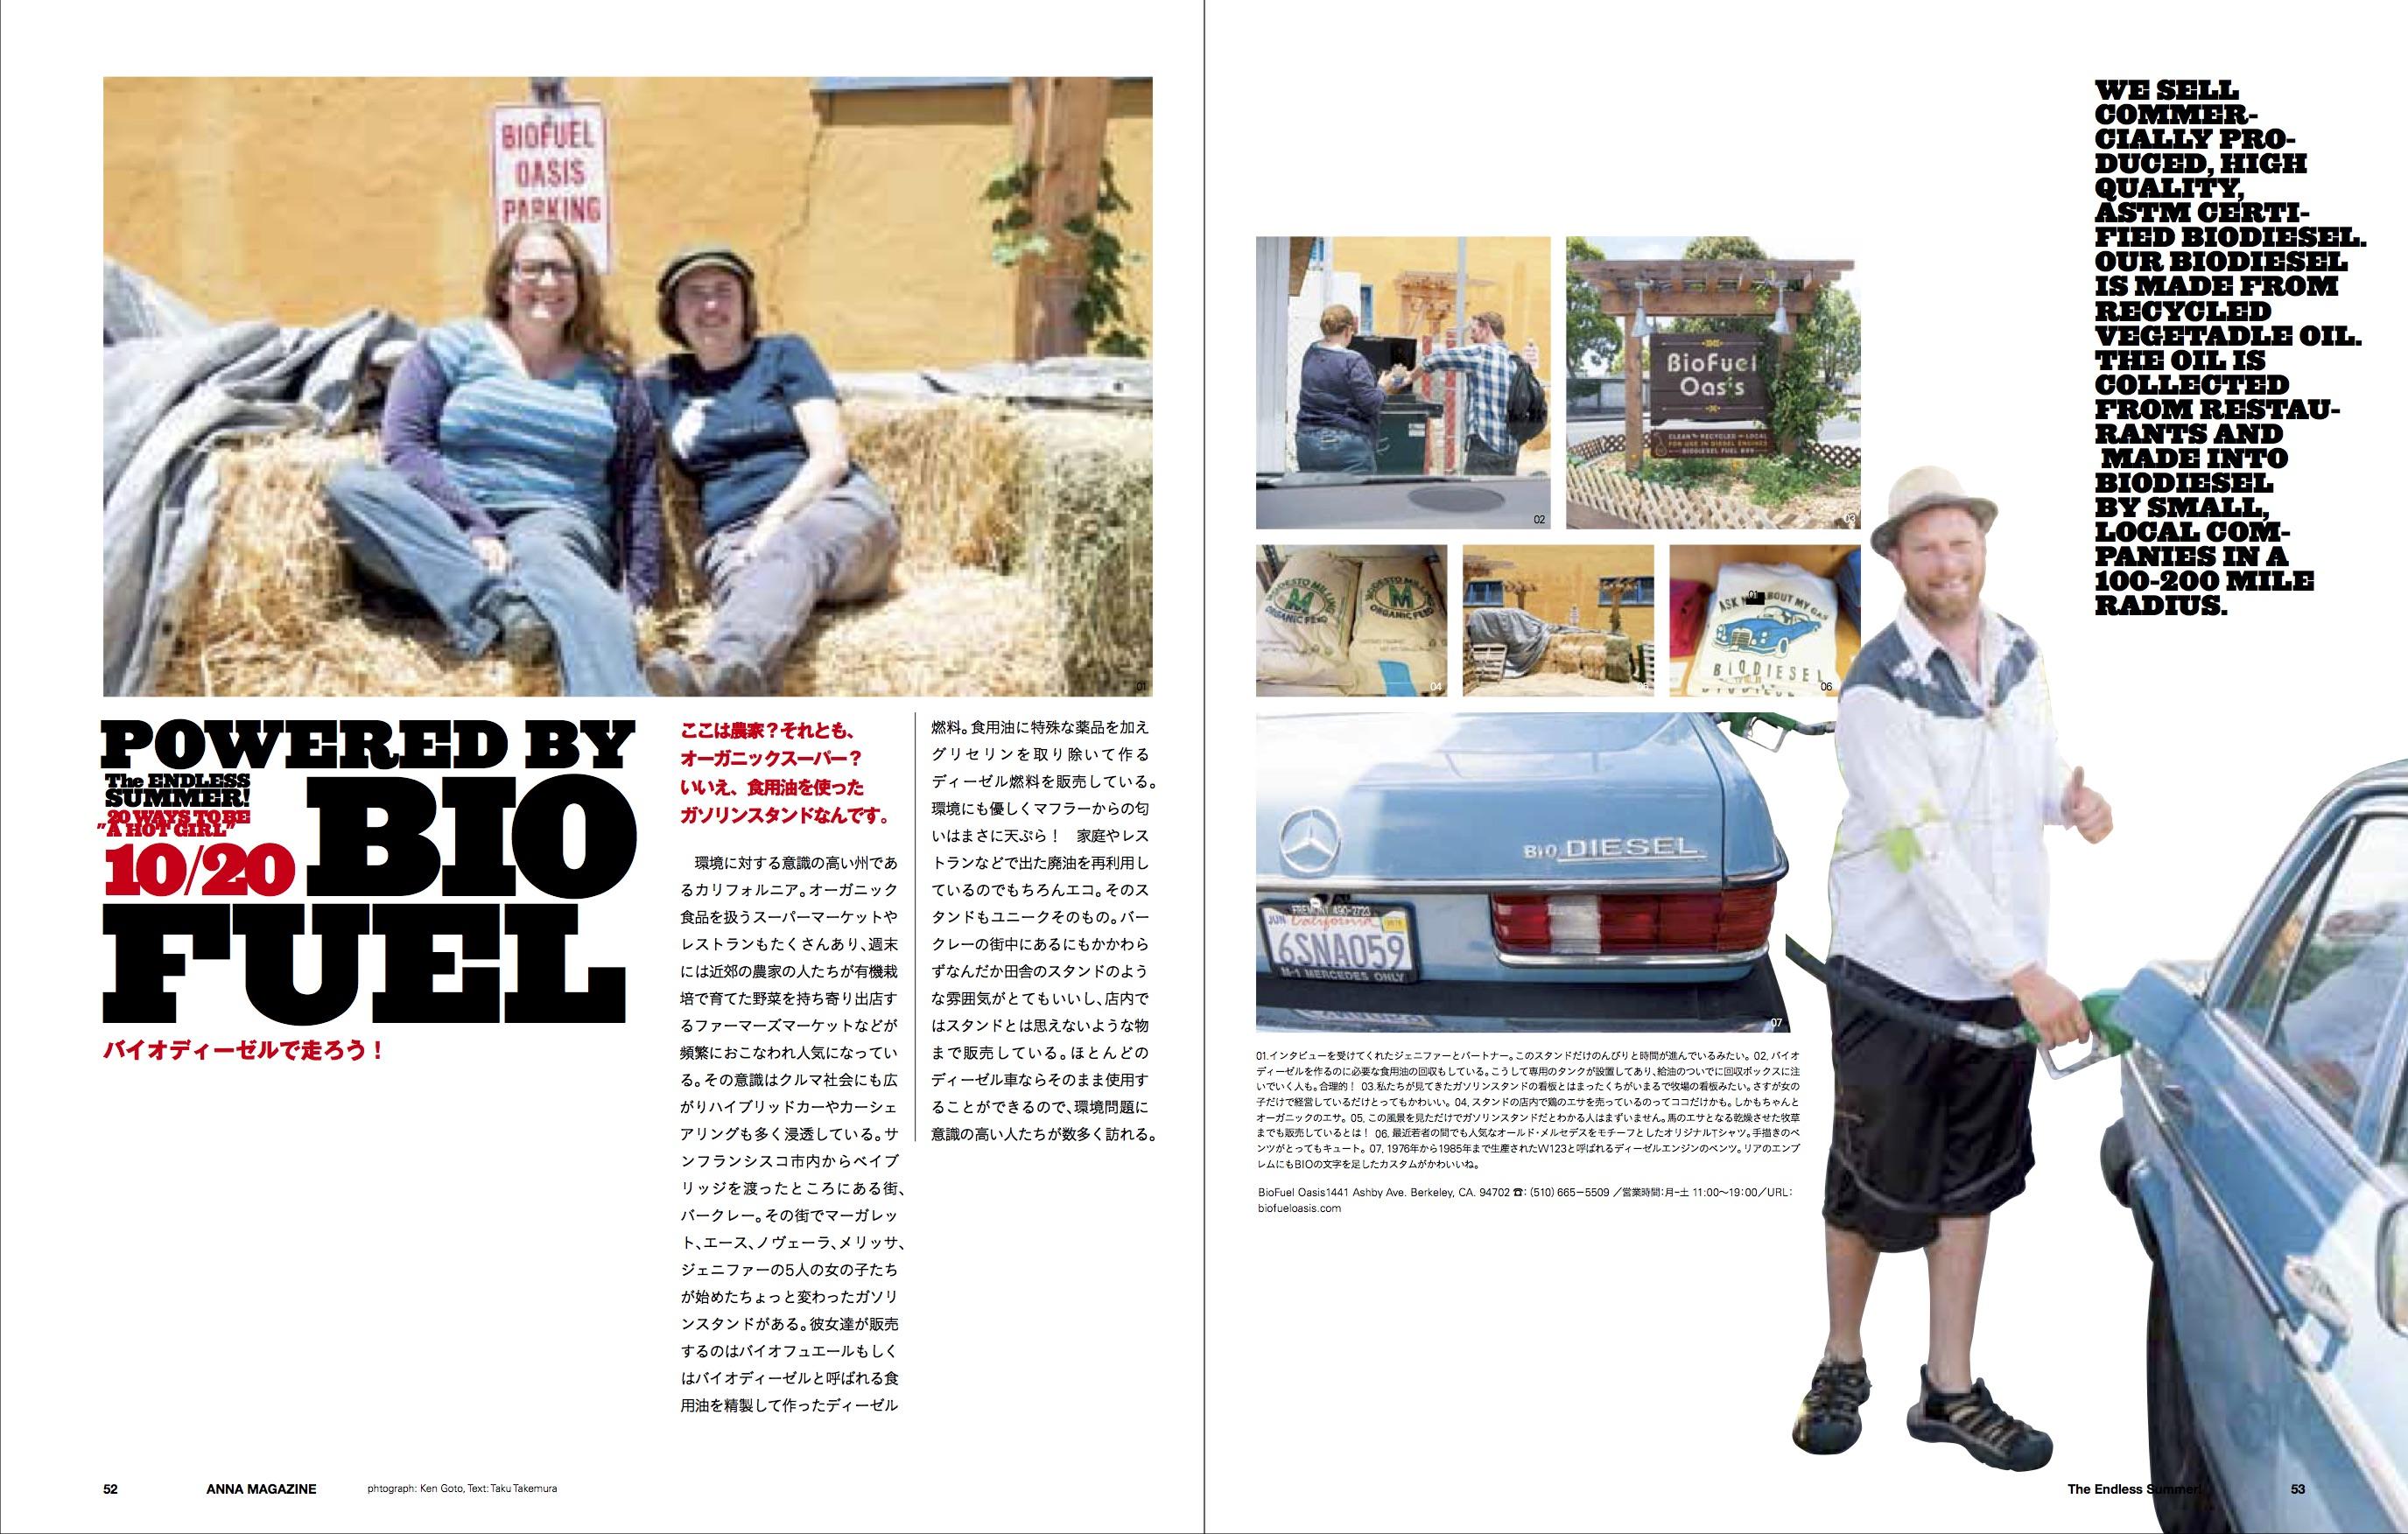 anna magazine Vol.3 P33